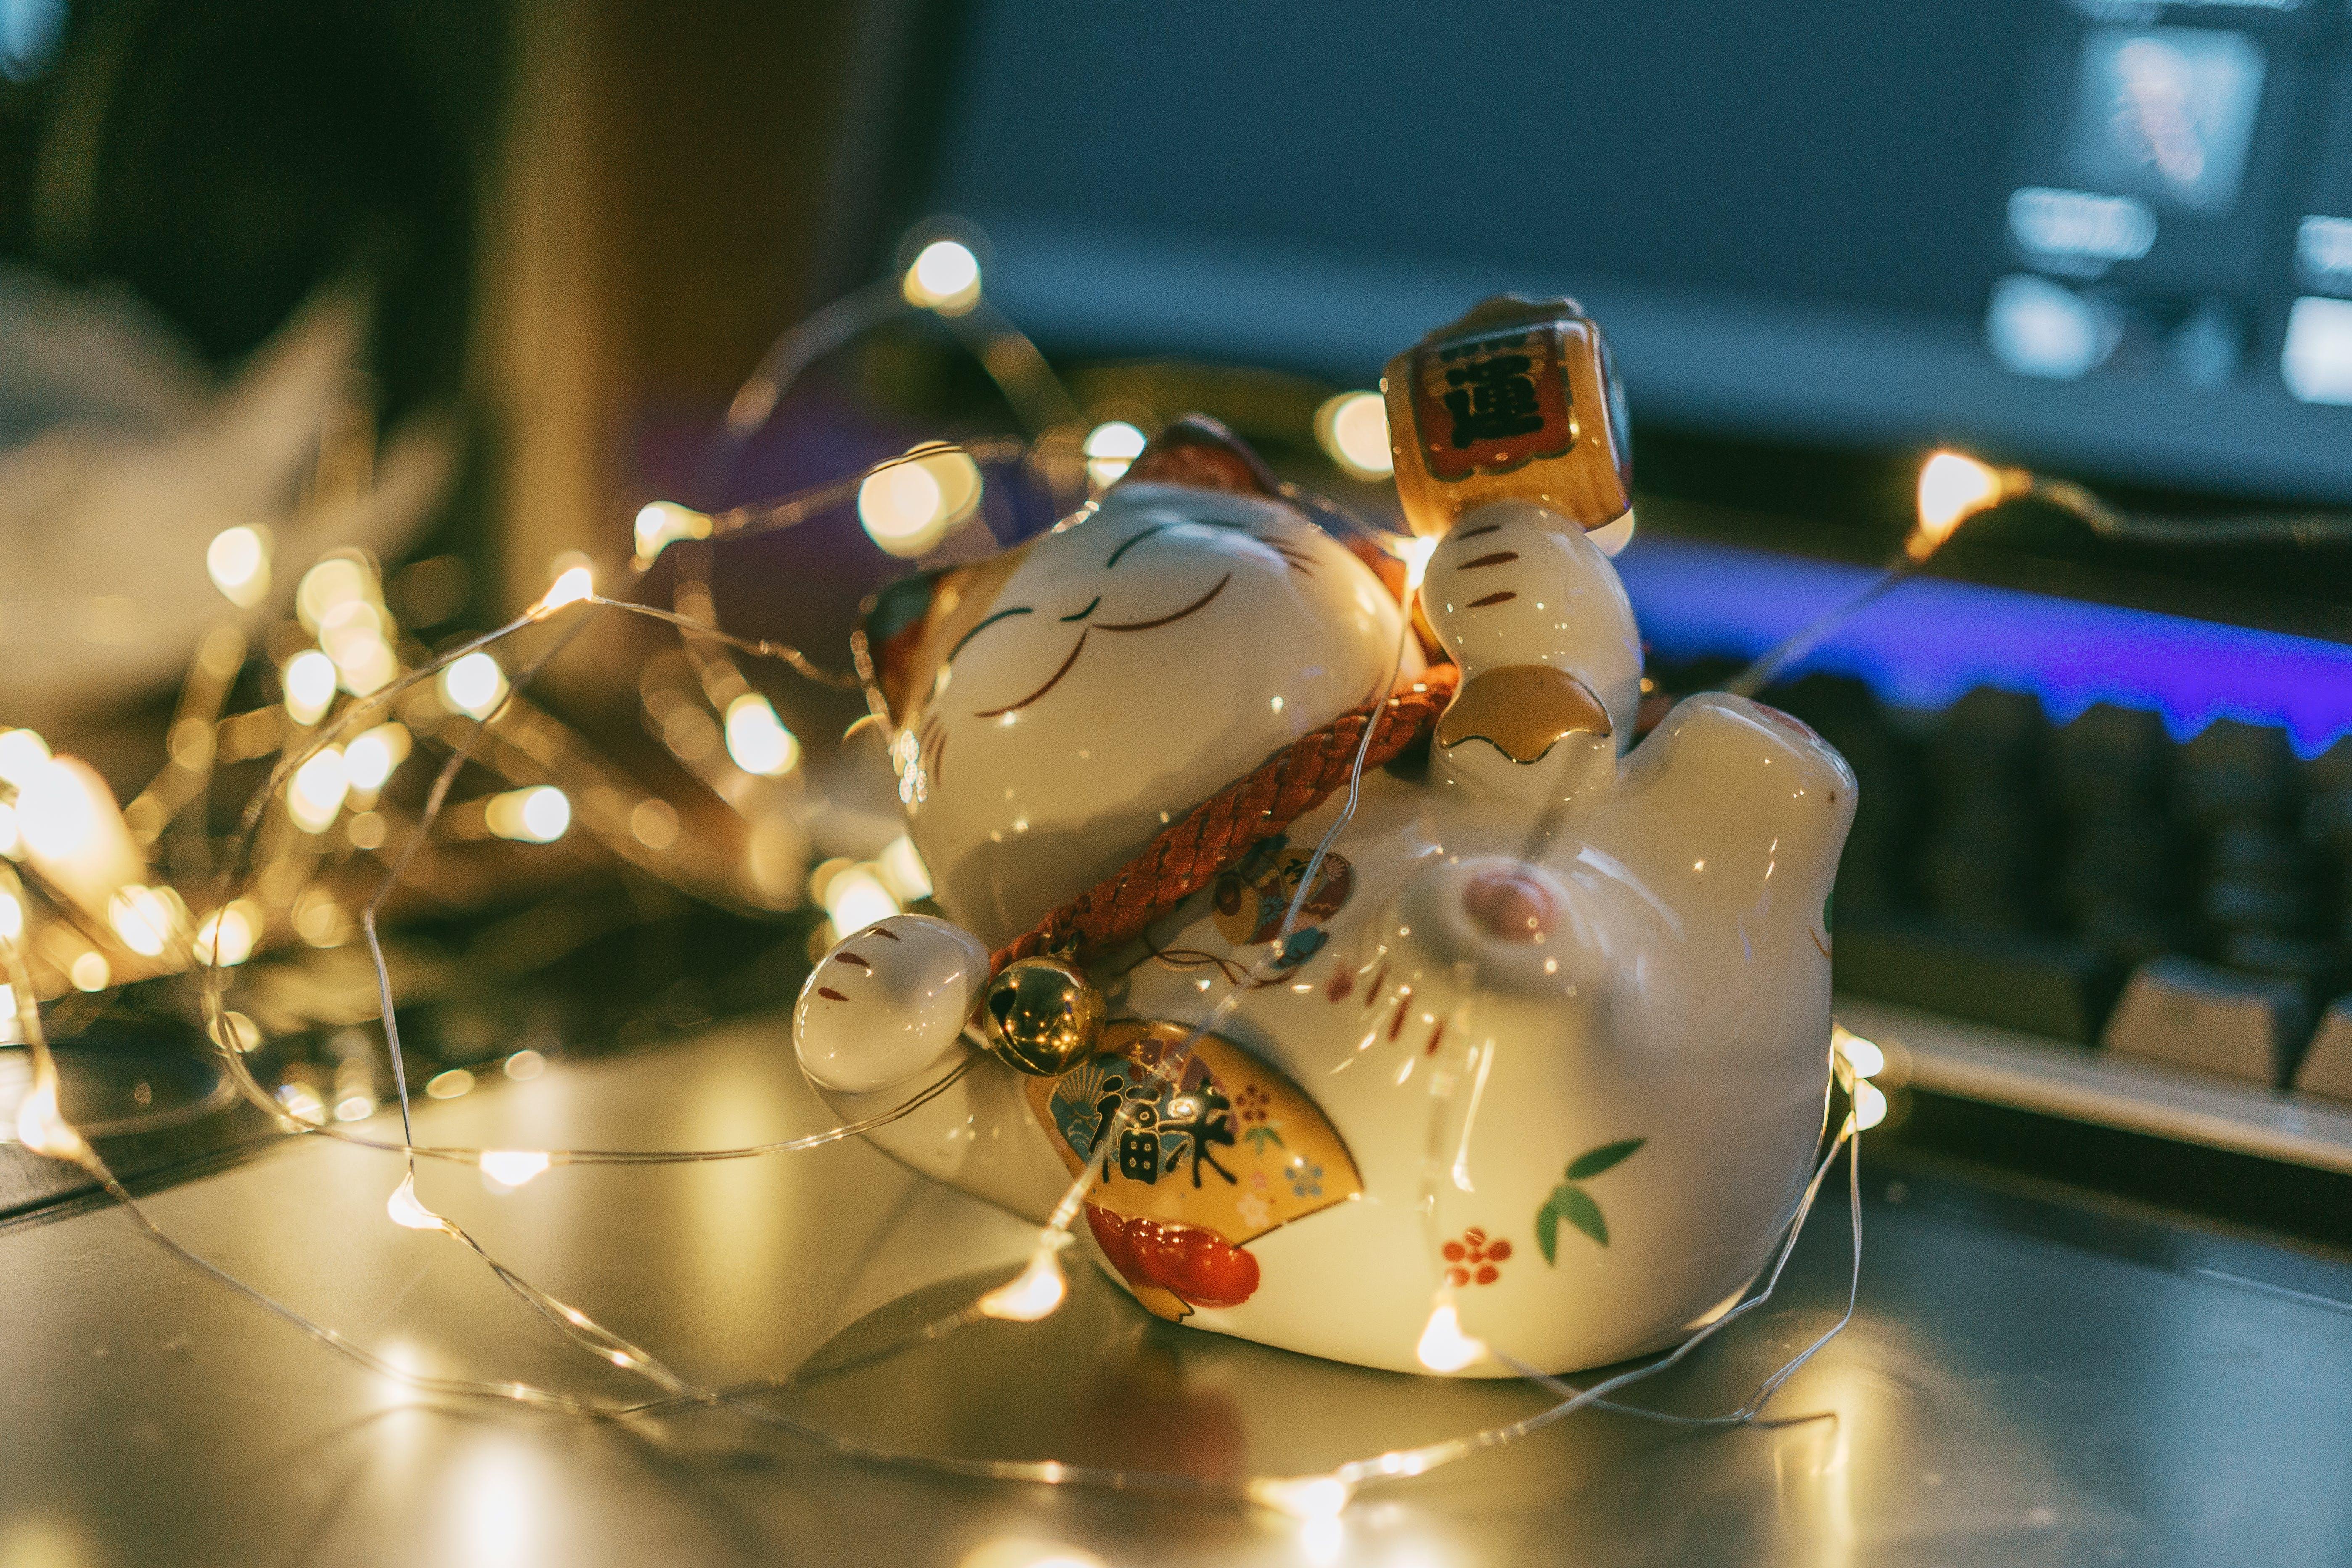 White Ceramic Cat Figurine With String Lights